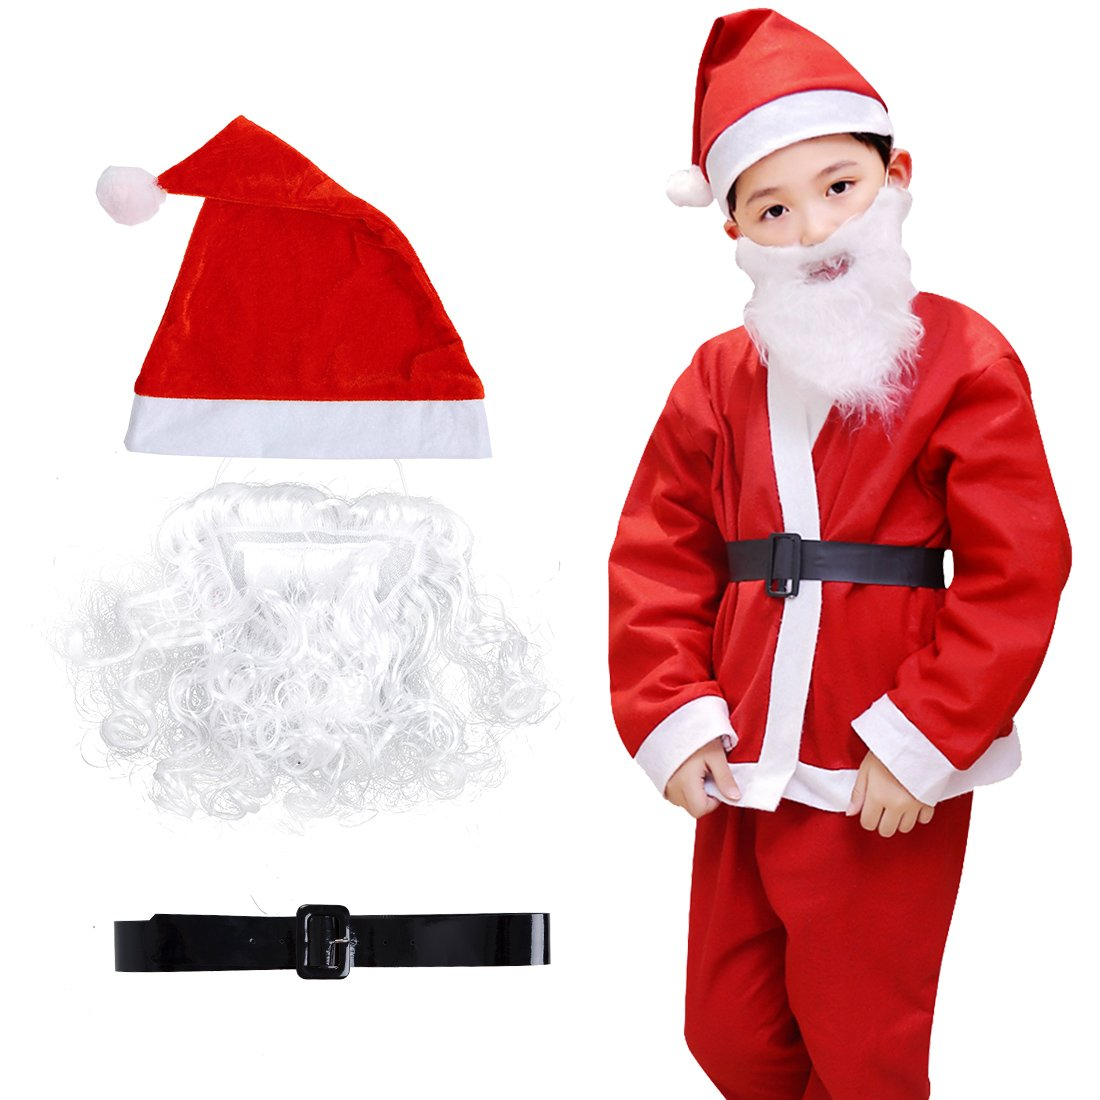 Christmas Santa Costume Set for Kids Boys 5pcs Christmas Costume Cosplay Outfit with Santa Hat Belt Red (Red)